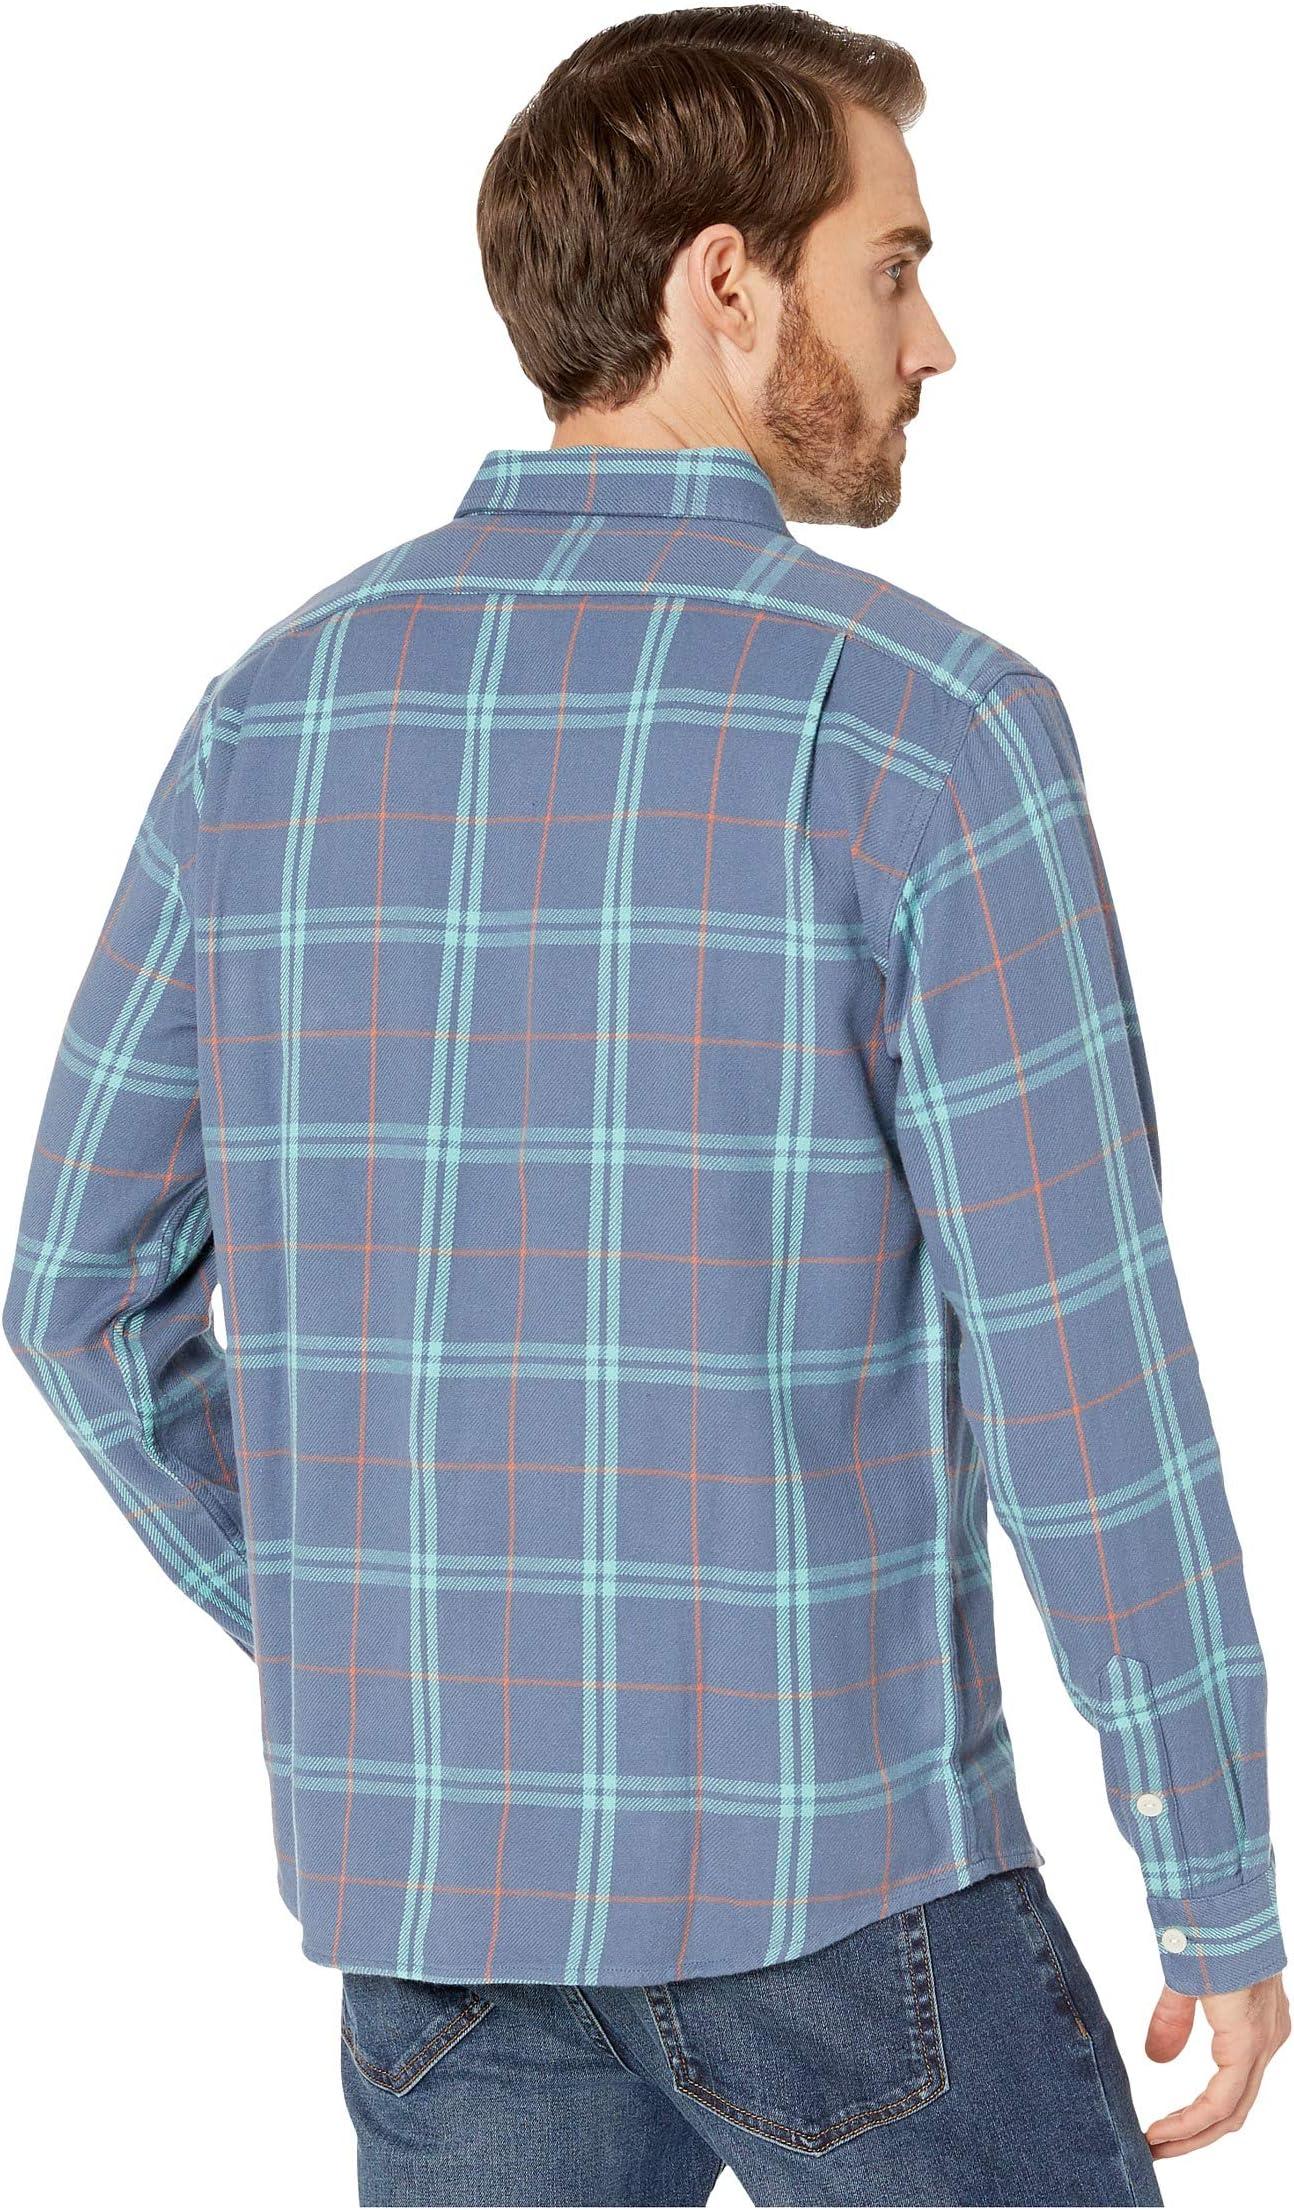 The Normal Brand Mountain Overshirt K6uSK